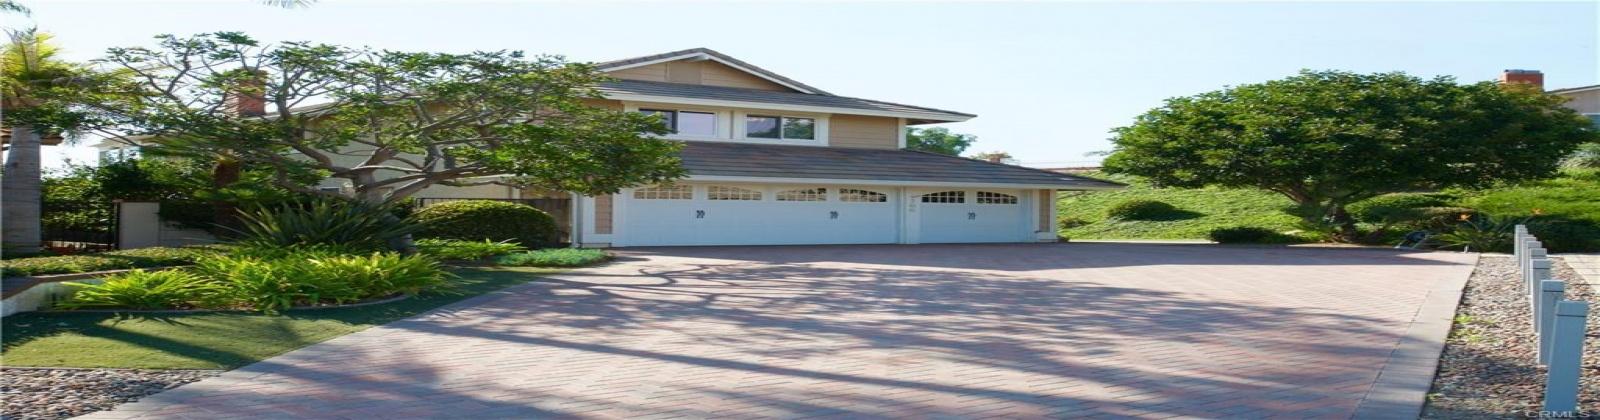 700 Calle Cumbre, California 92673, 4 Bedrooms Bedrooms, ,2 BathroomsBathrooms,Home,Sold,Calle Cumbre,1015